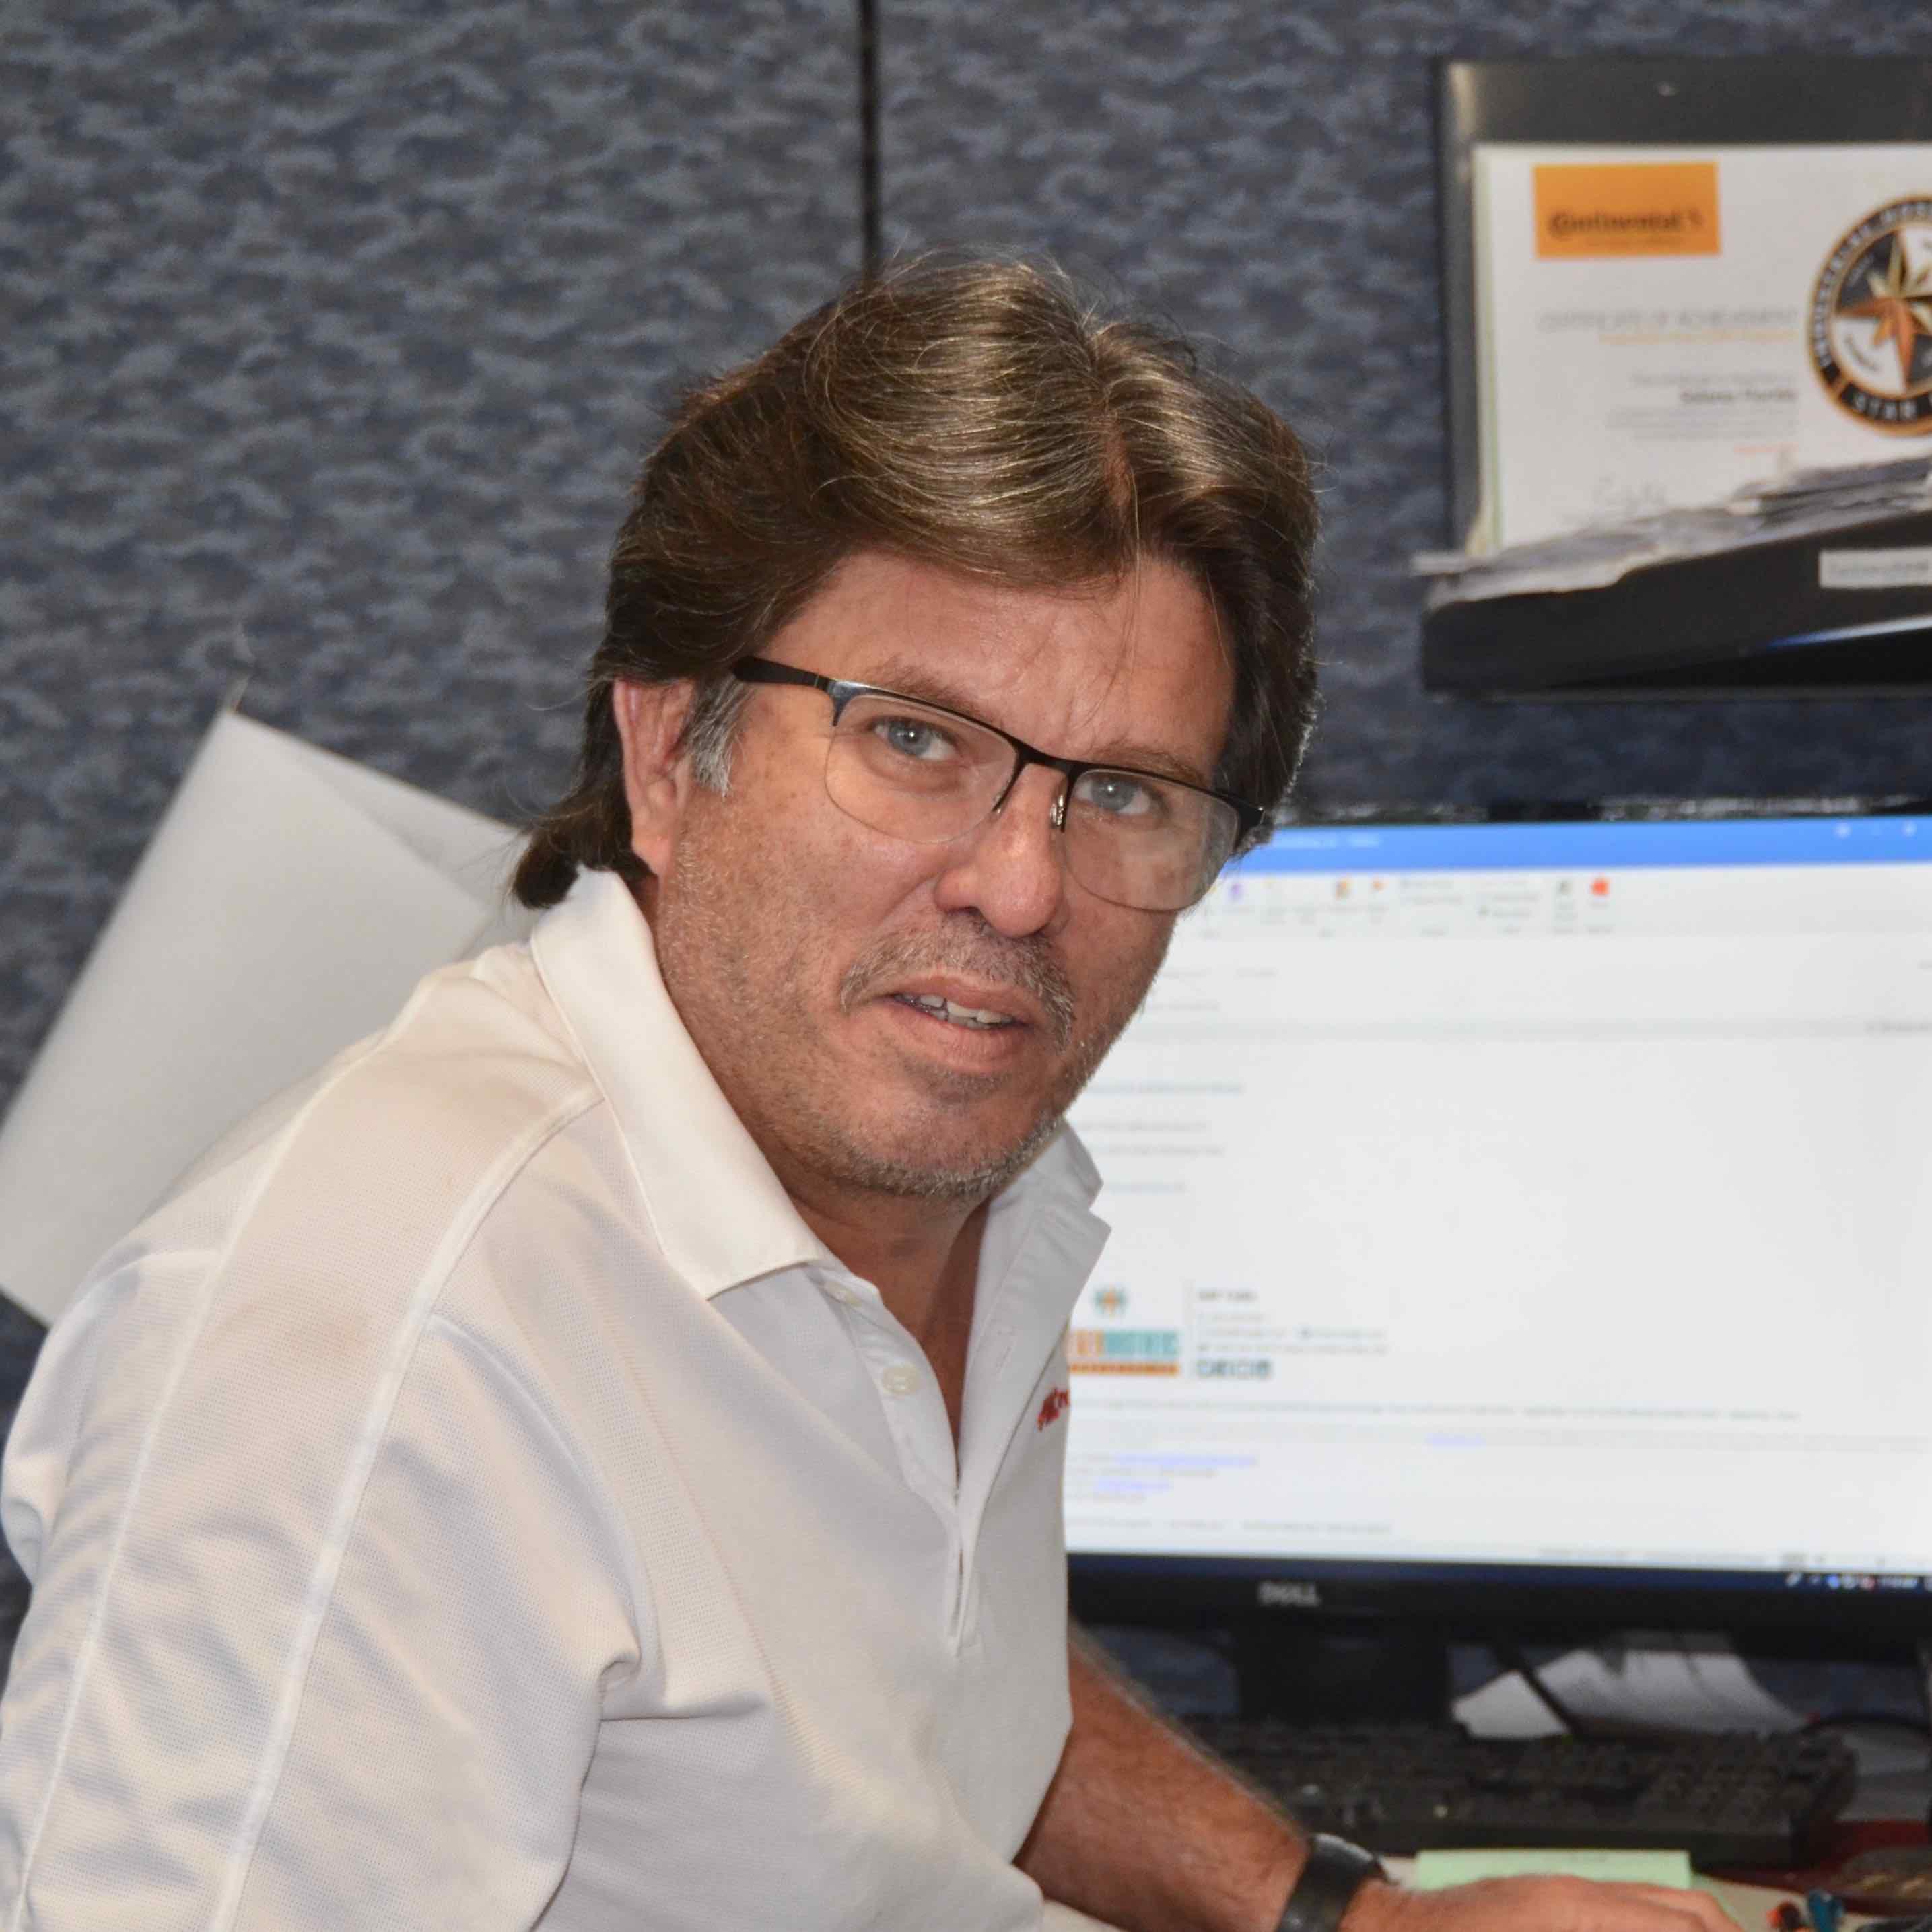 Luis Calzada